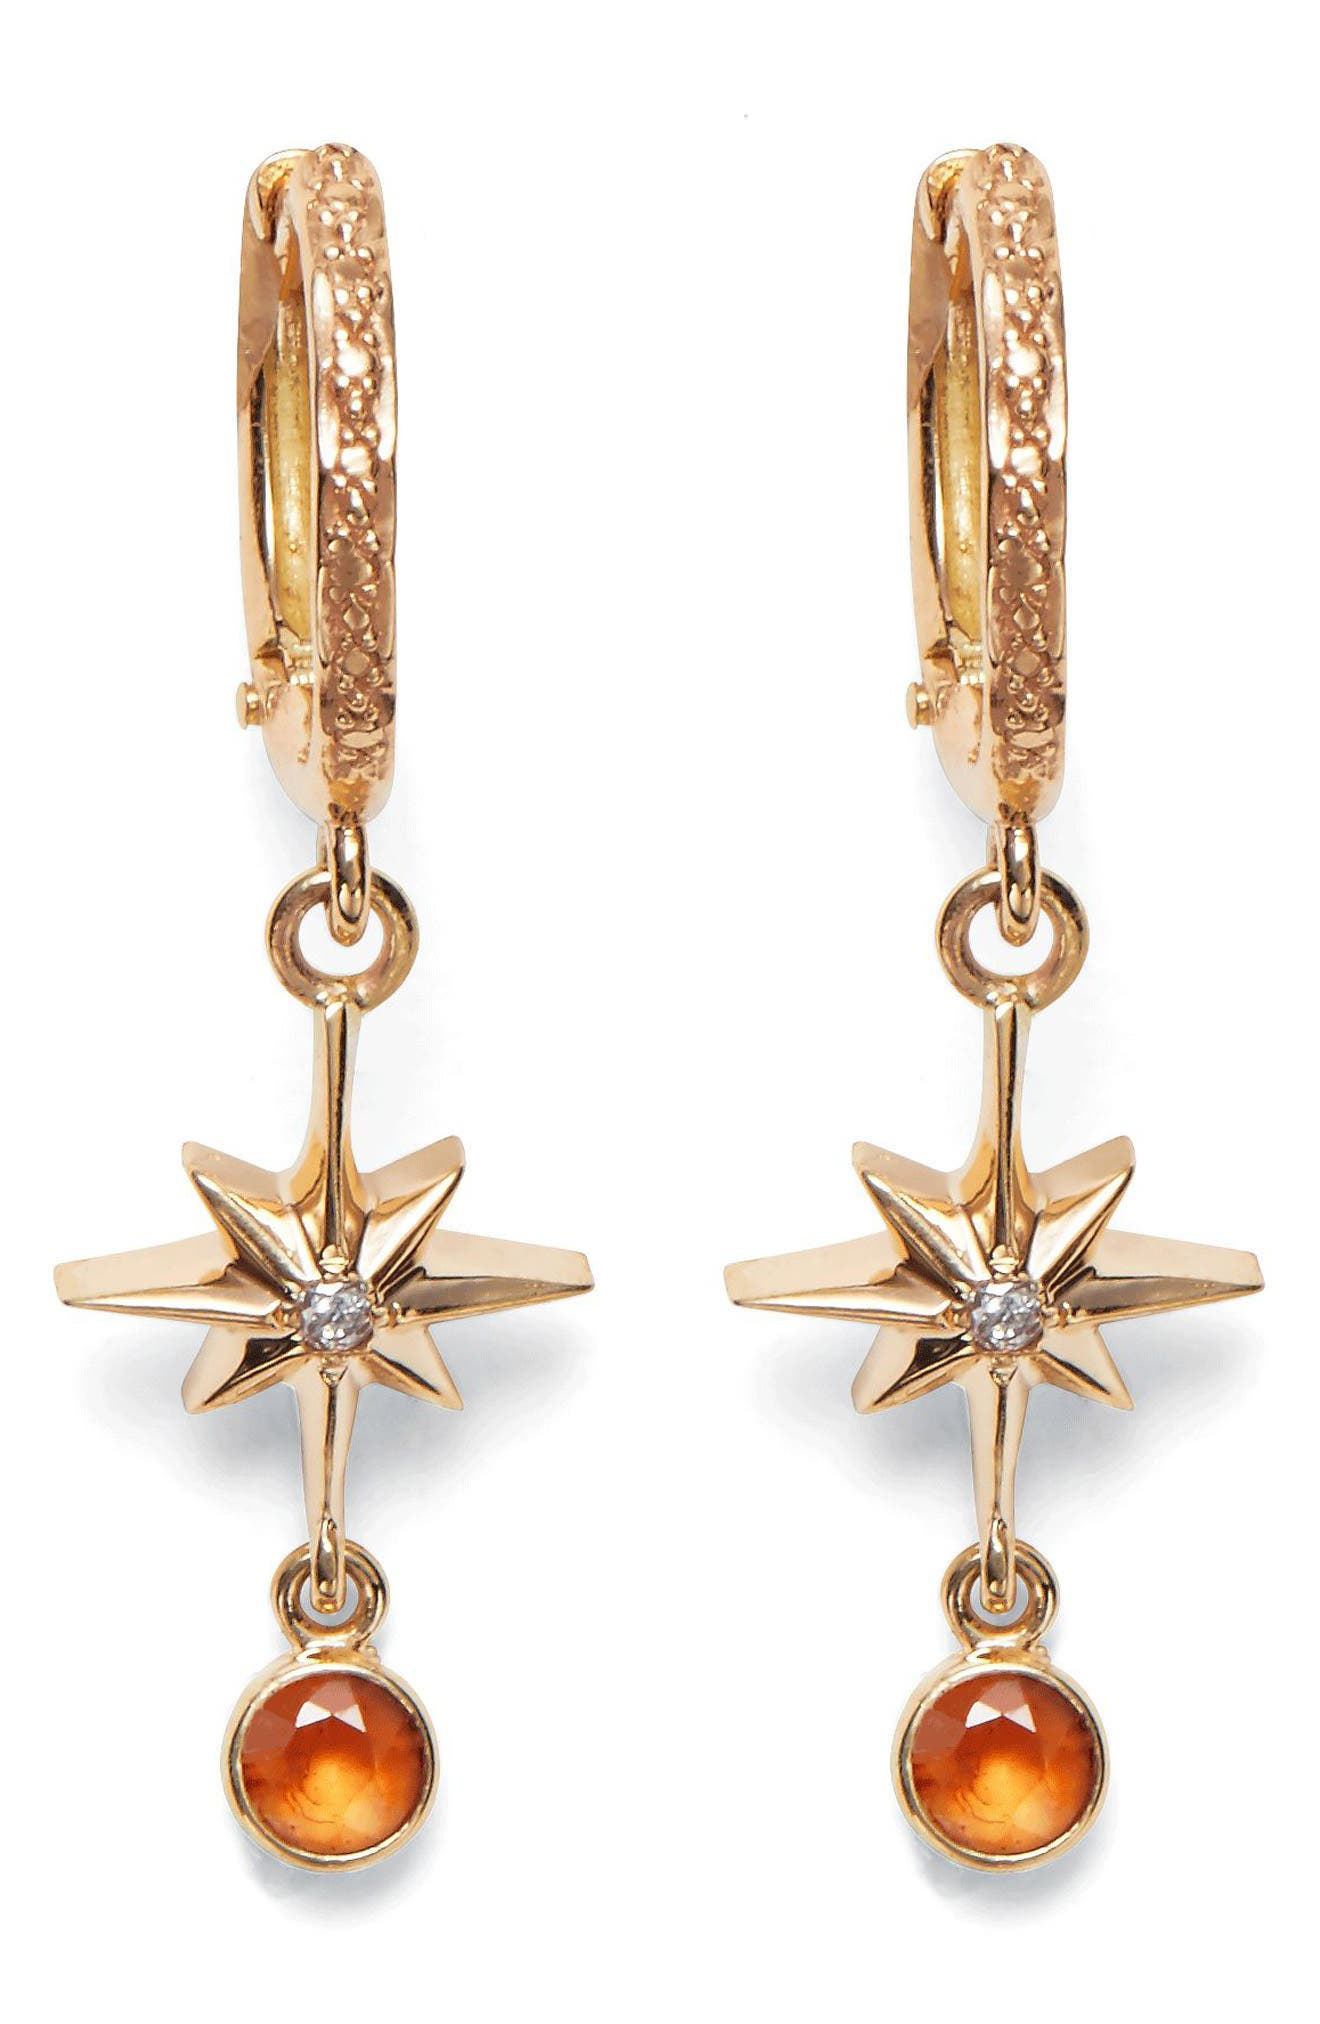 MARLO LAZ Lucky Star Diamond & Sapphire Earrings in Yellow Gold